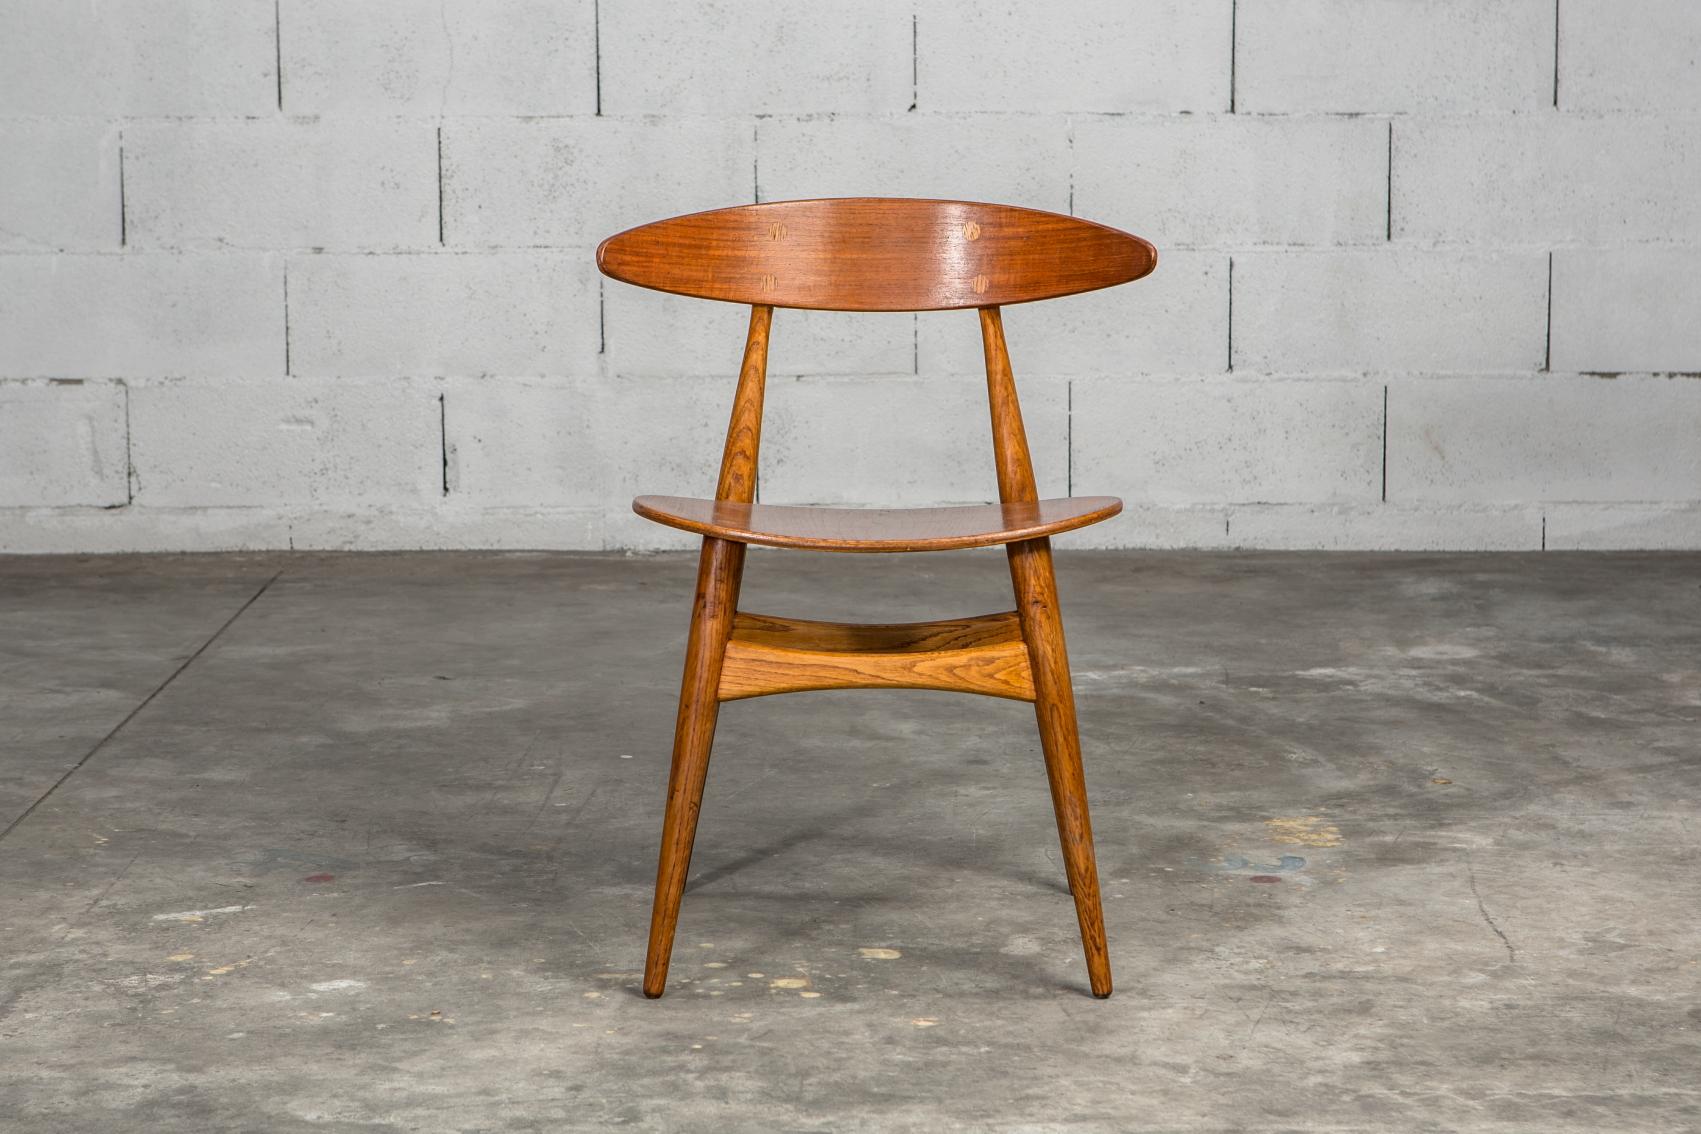 Molded teak backrests and oak frames CH 33 chairs - Hans J. Wegner for Carl Hansen & Son - Front view